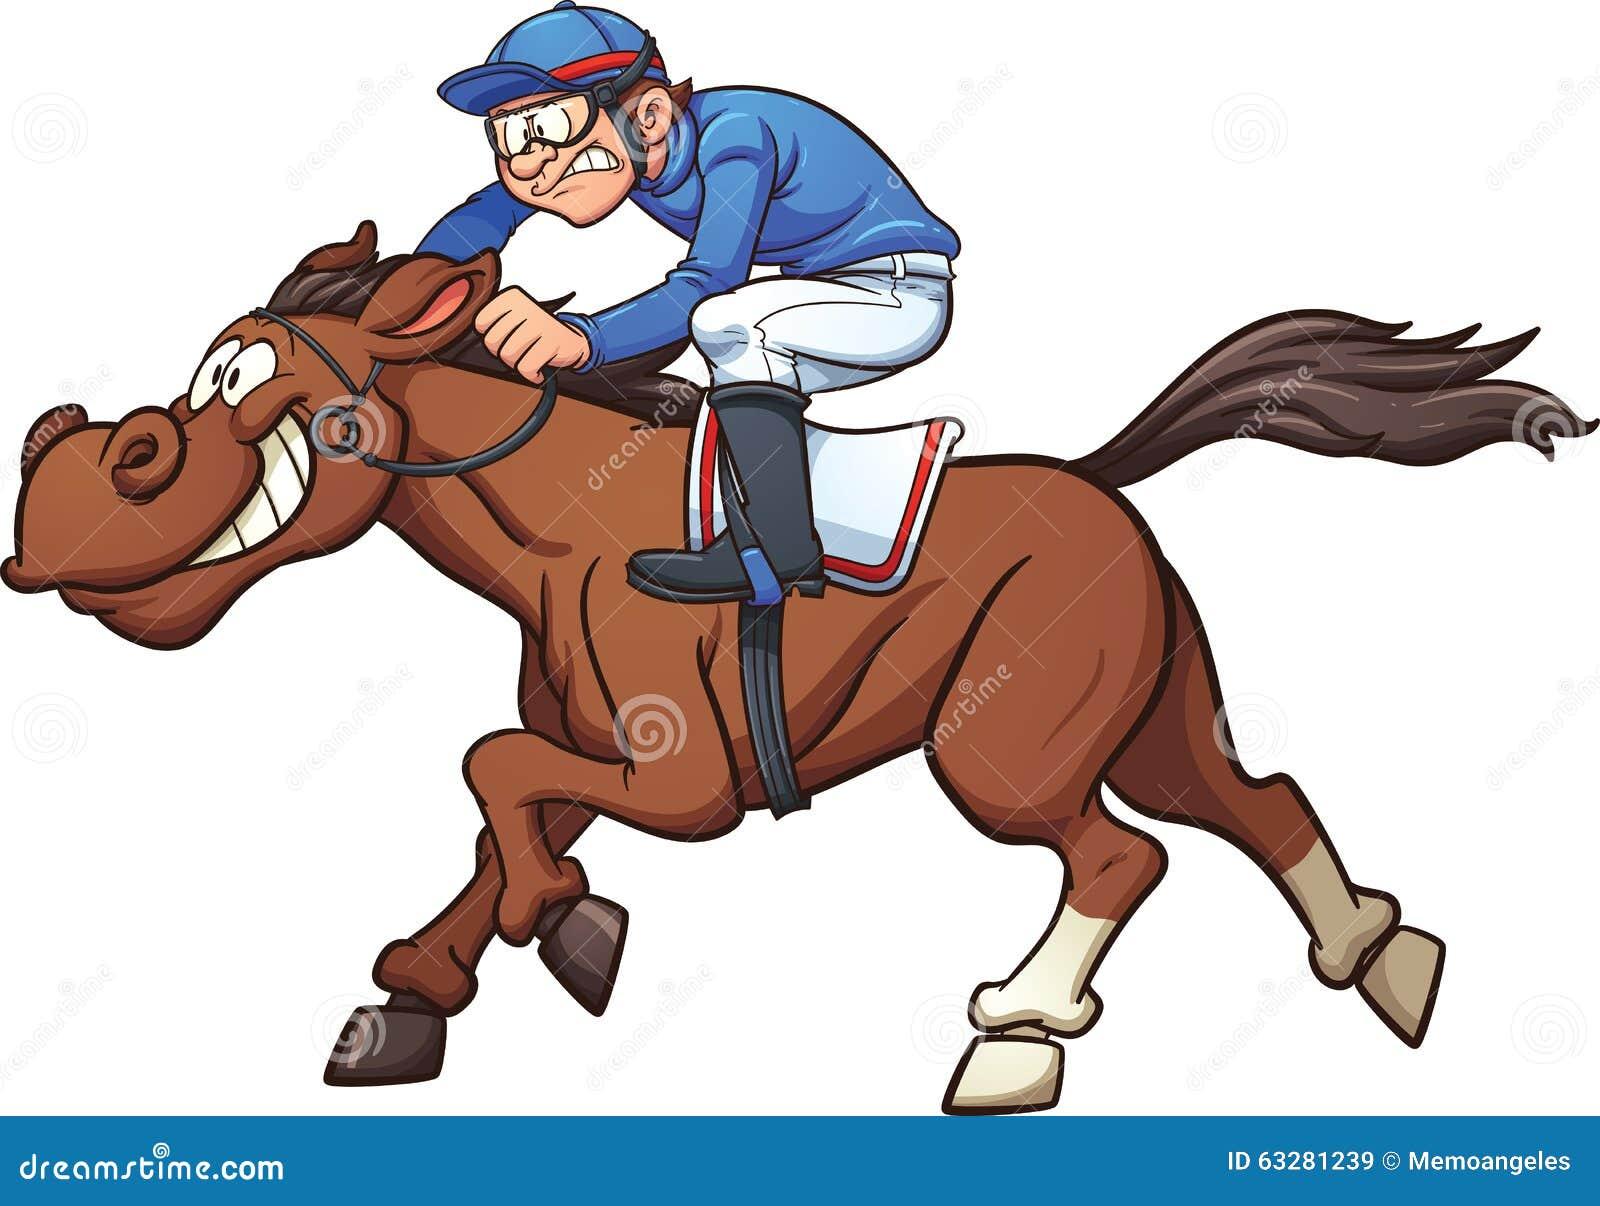 race-horse-vector-clip-art-illustration-simple-gradients-jockey-horse ...